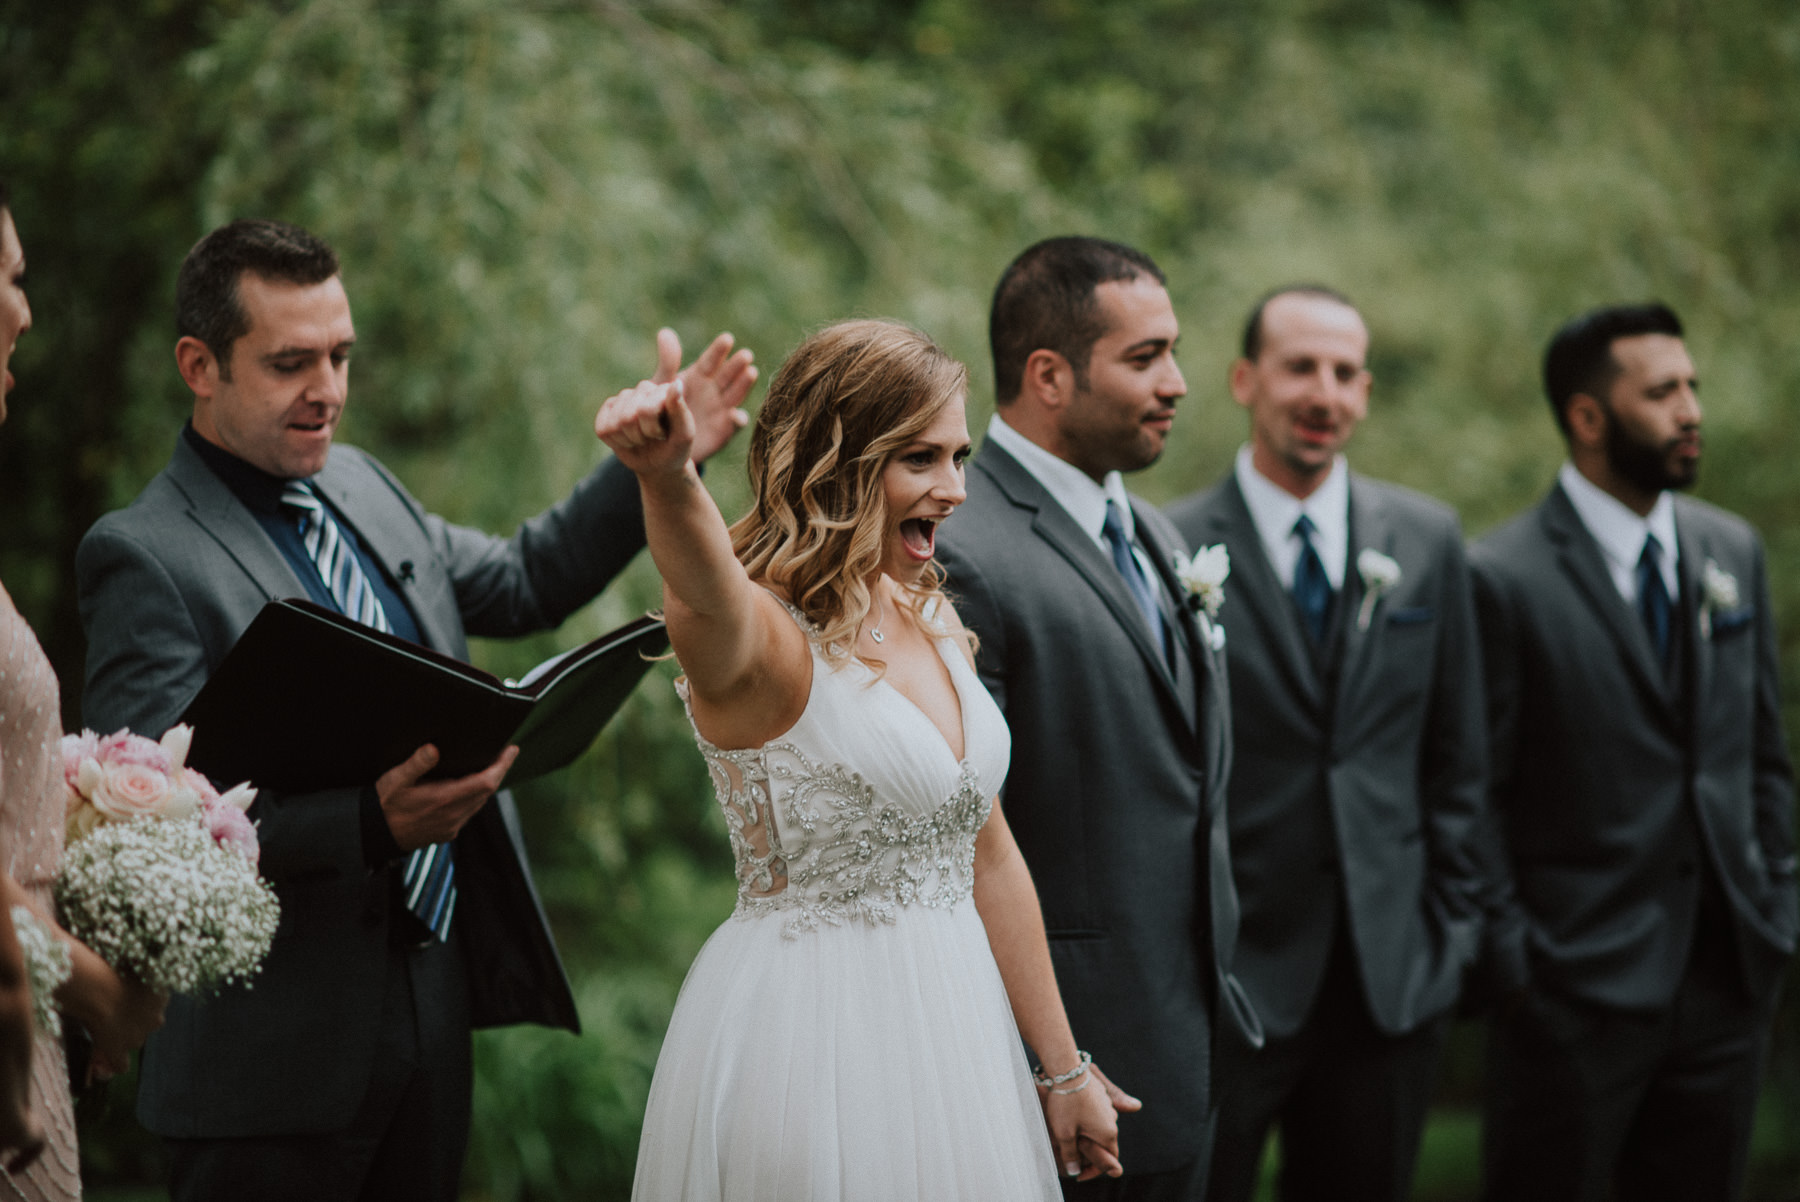 appleford-estate-wedding-photography-60.jpg